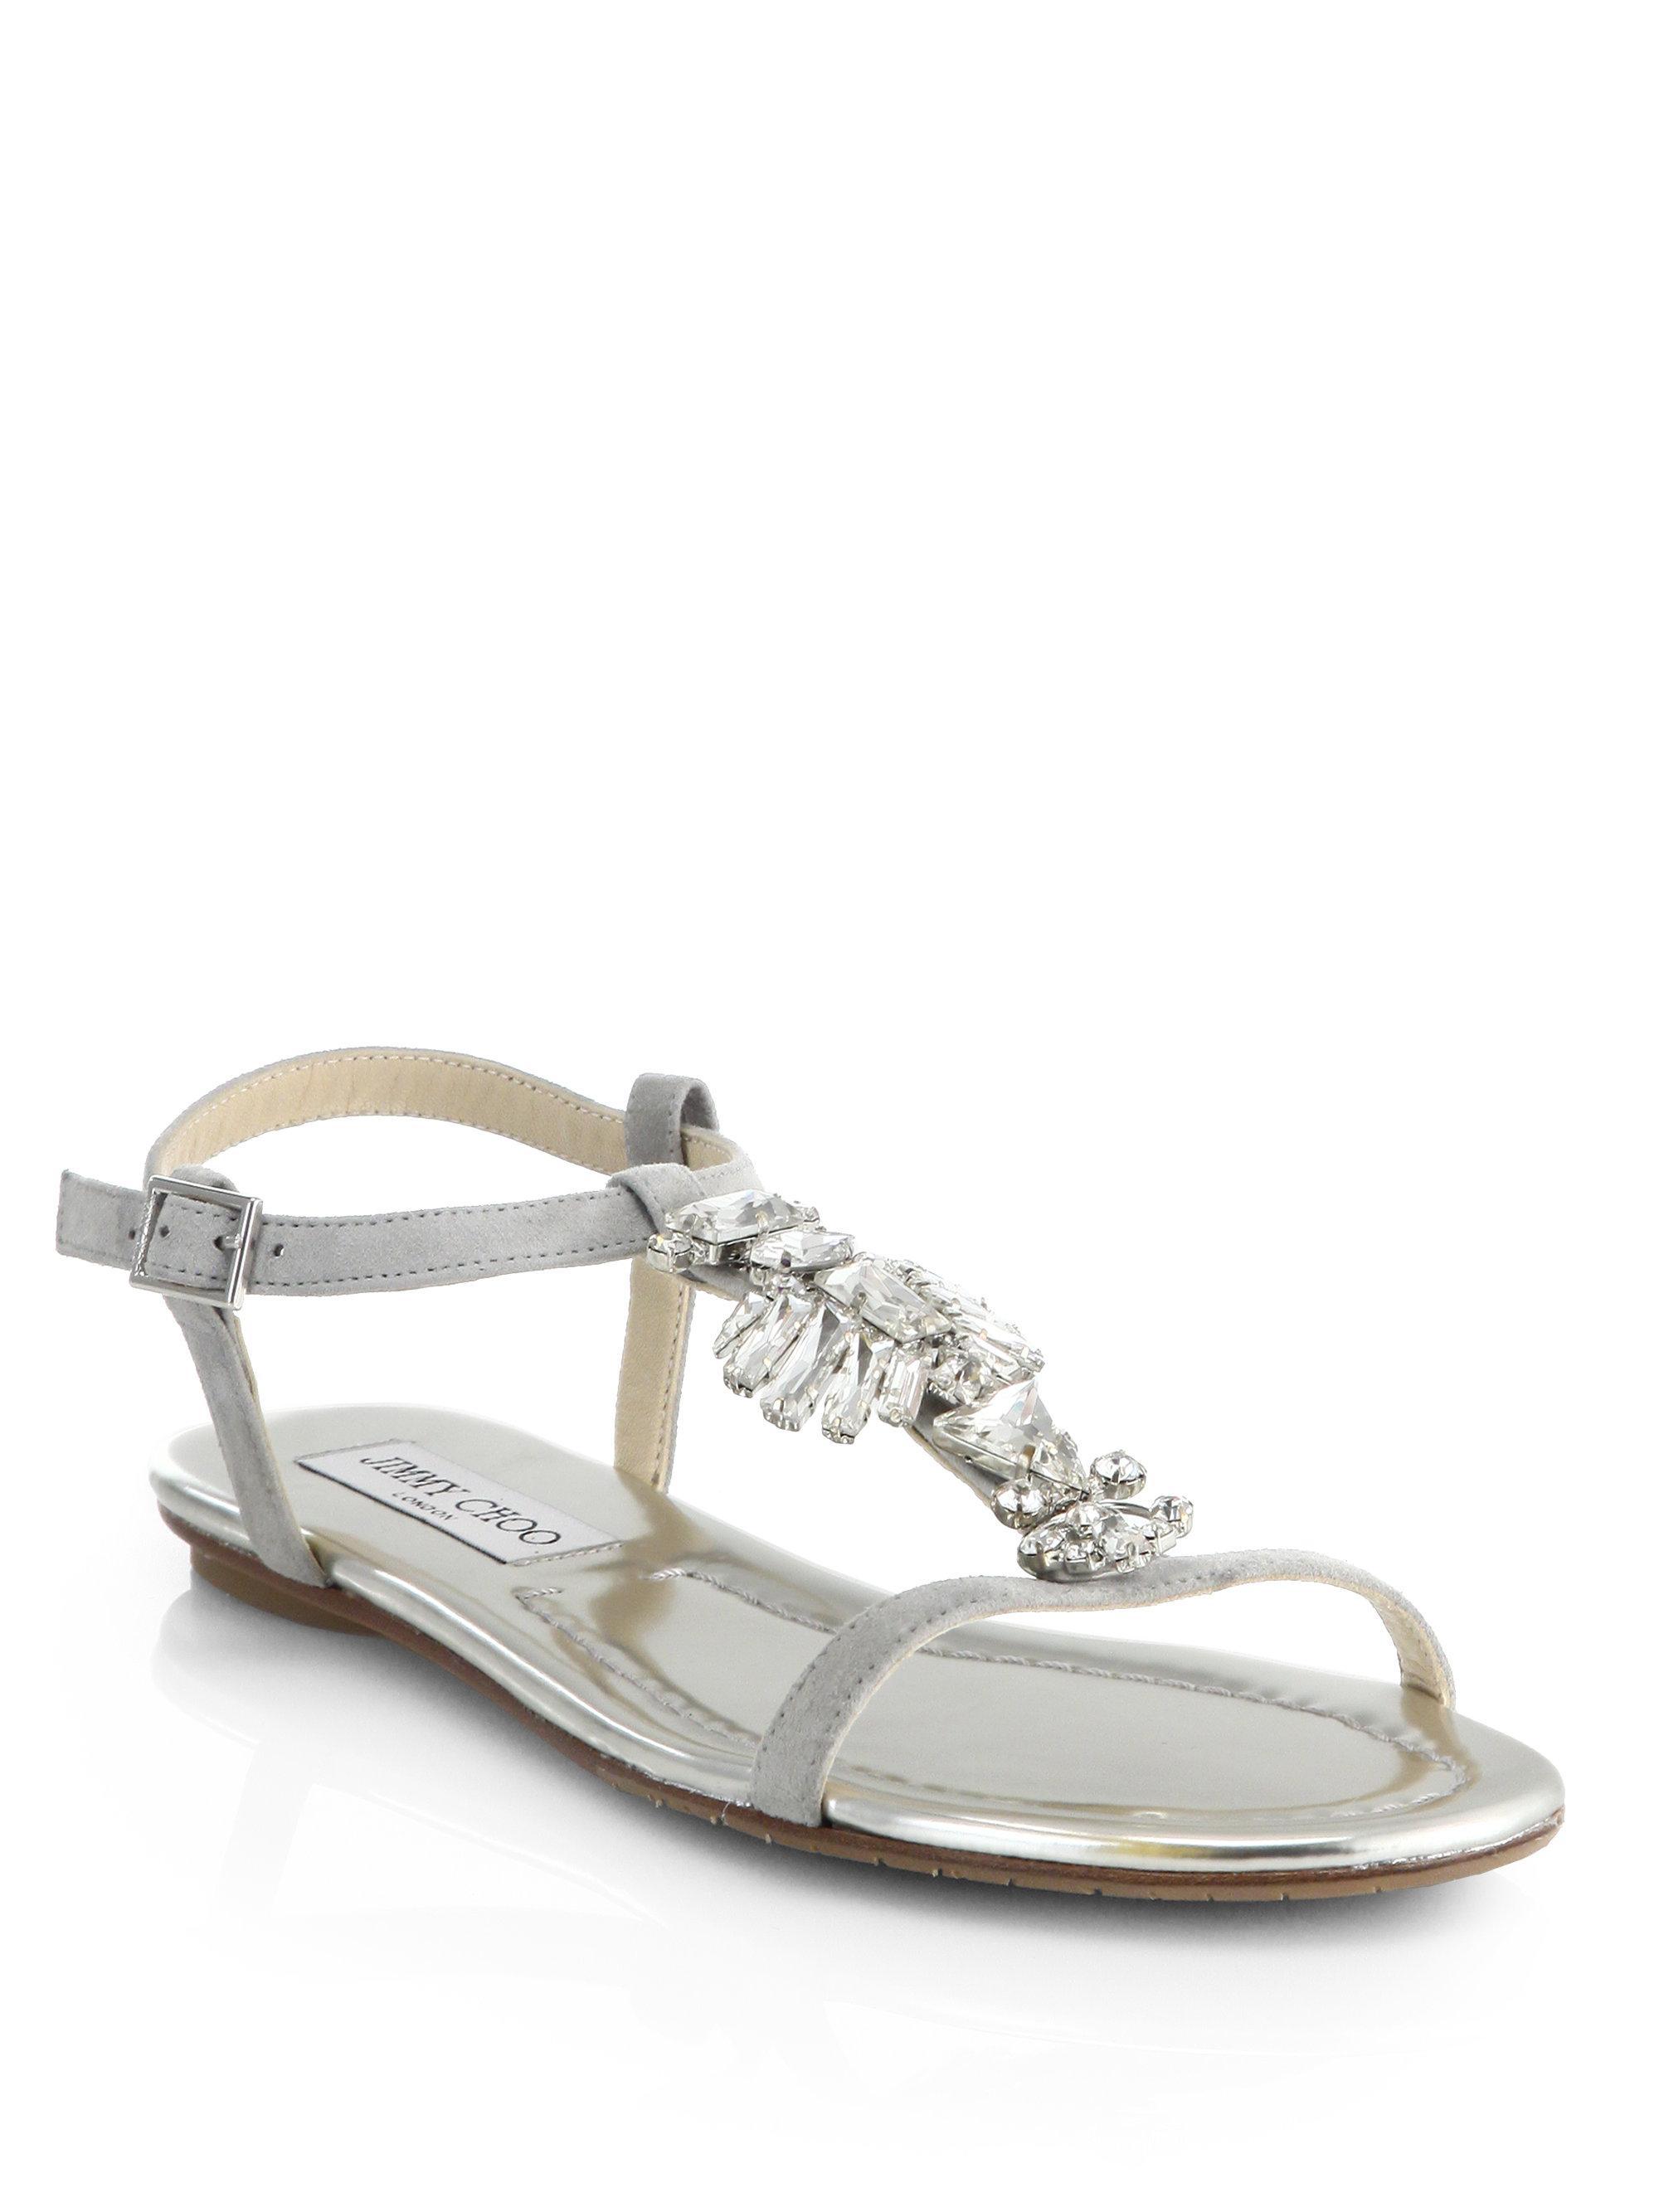 Jimmy choo Embellished Flat Sandals Wholesale Price Cheap Price cr1KQC